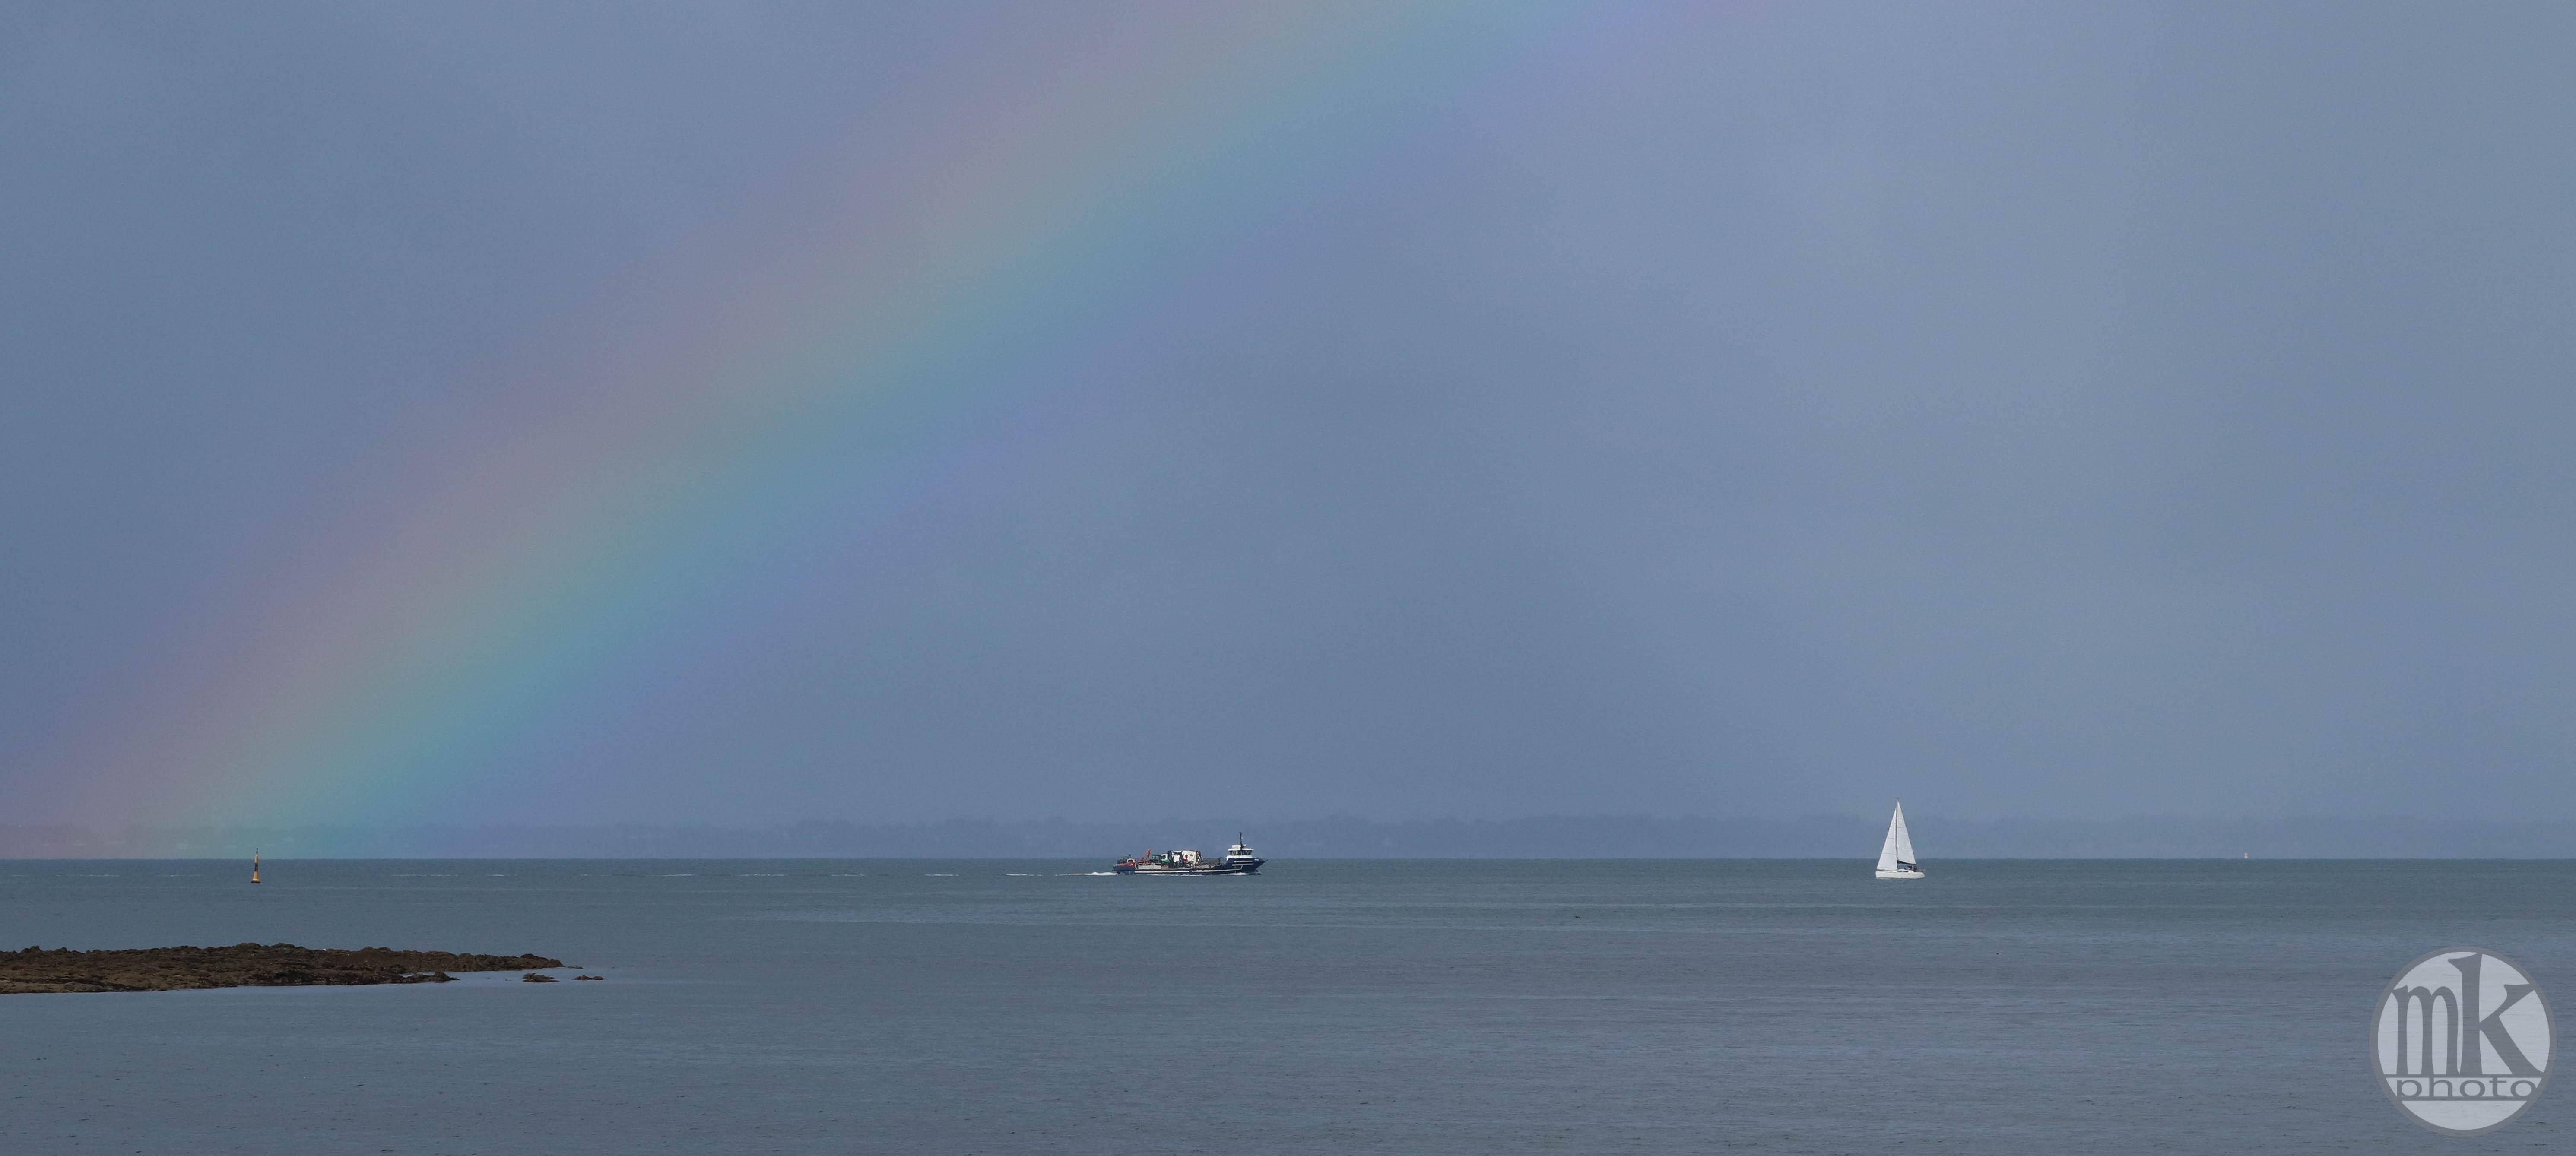 baie de quiberon, 16 juin 20, 9-25